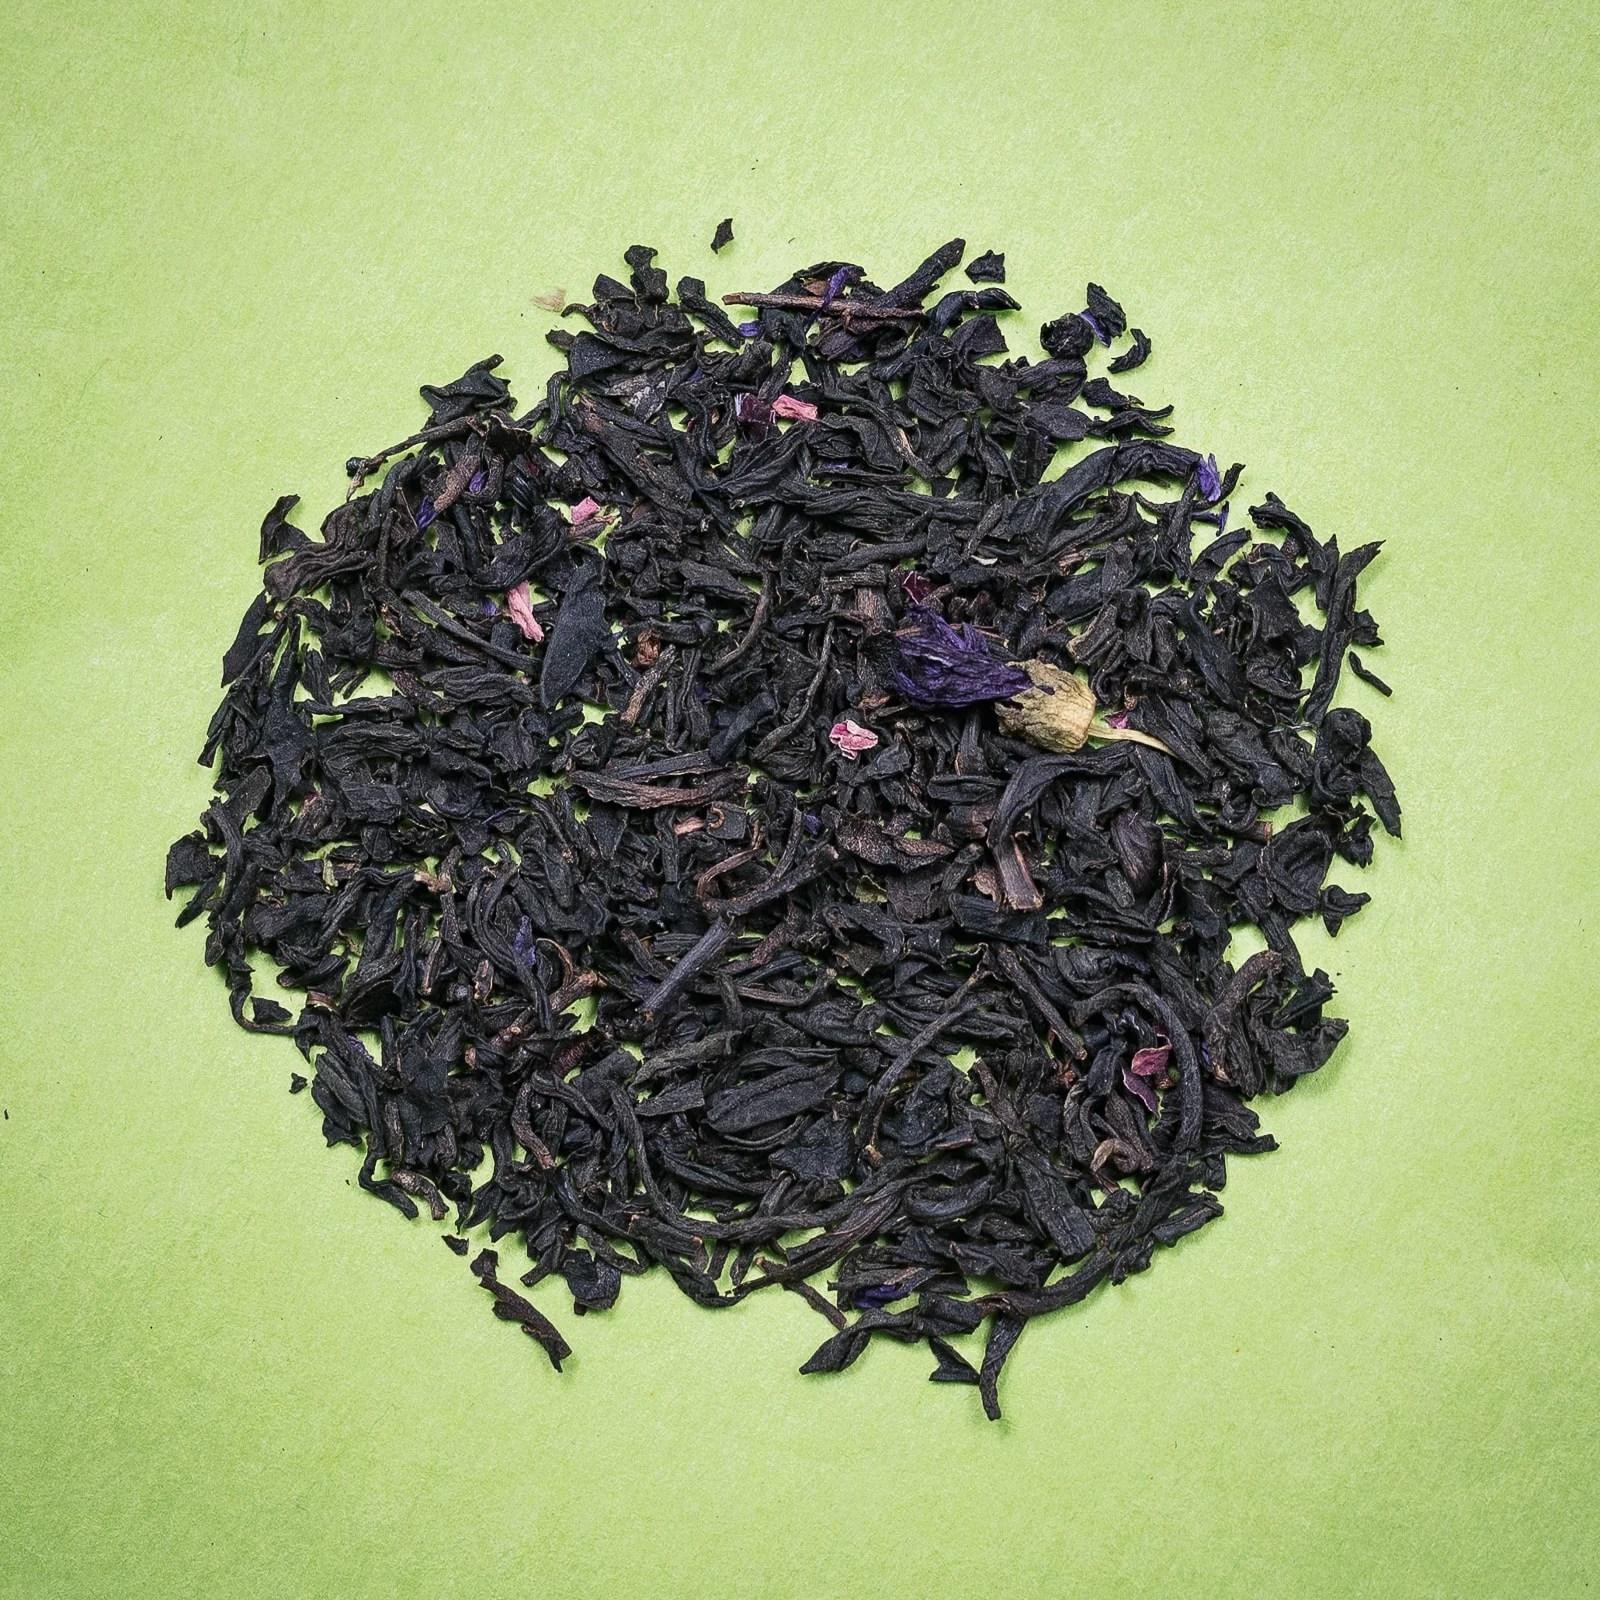 Anbassa-artisan-torrefacteur-the-noir-aromatise-Vasco-De-Gama-GUP